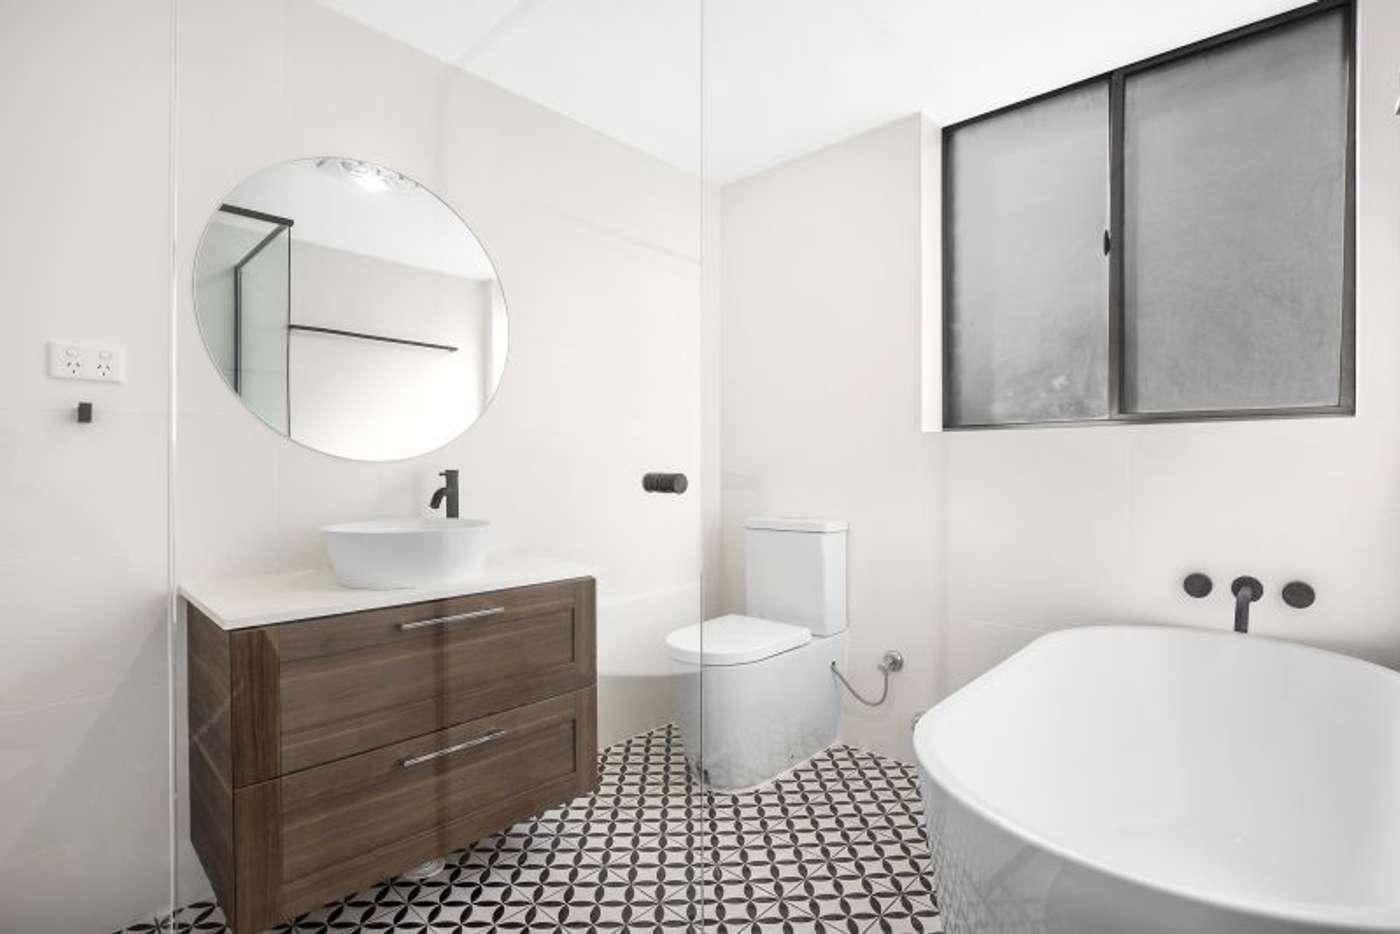 Sixth view of Homely apartment listing, 6/2 Kynaston Avenue, Randwick NSW 2031